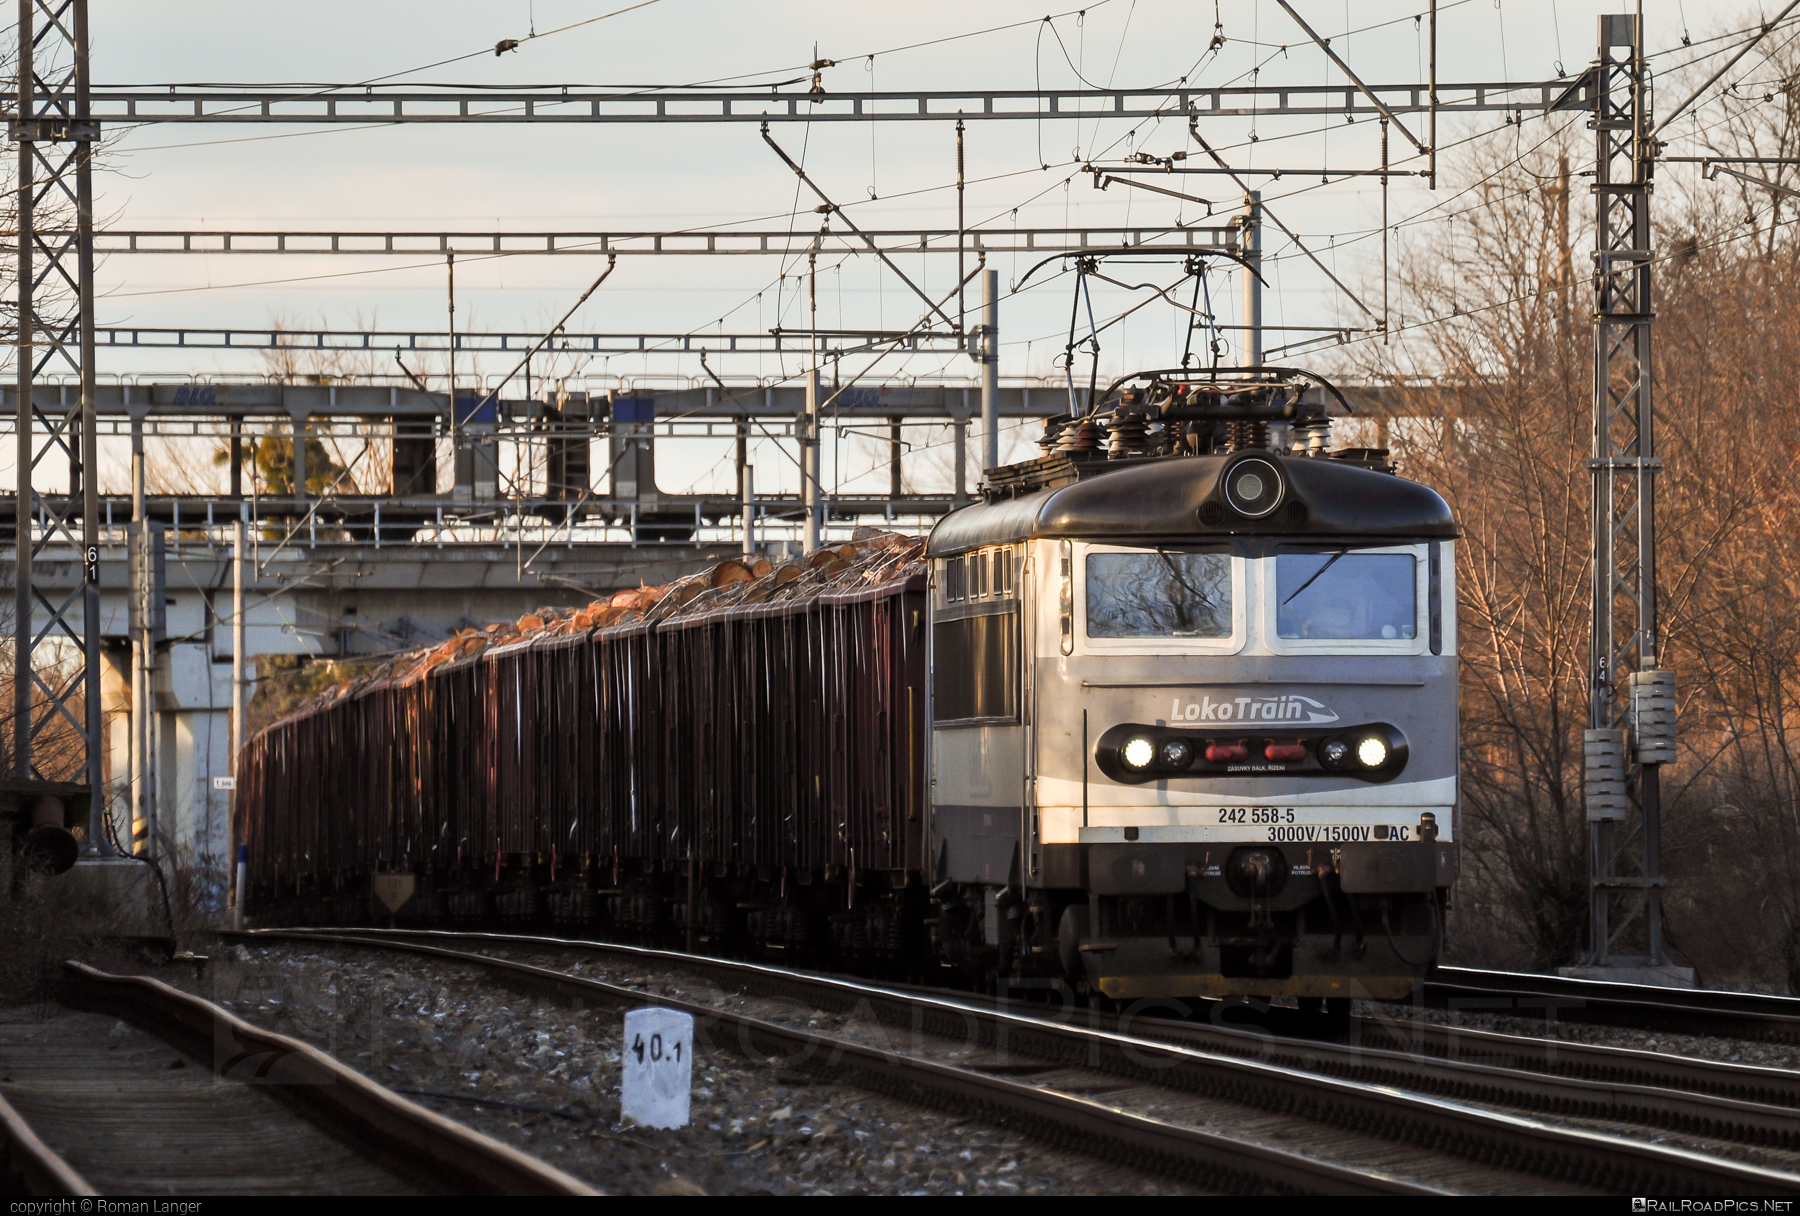 Škoda 73E - 242 558-5 operated by Loko Train s.r.o. #locomotive242 #lokotrain #lokotrainsro #plechac #skoda #skoda73e